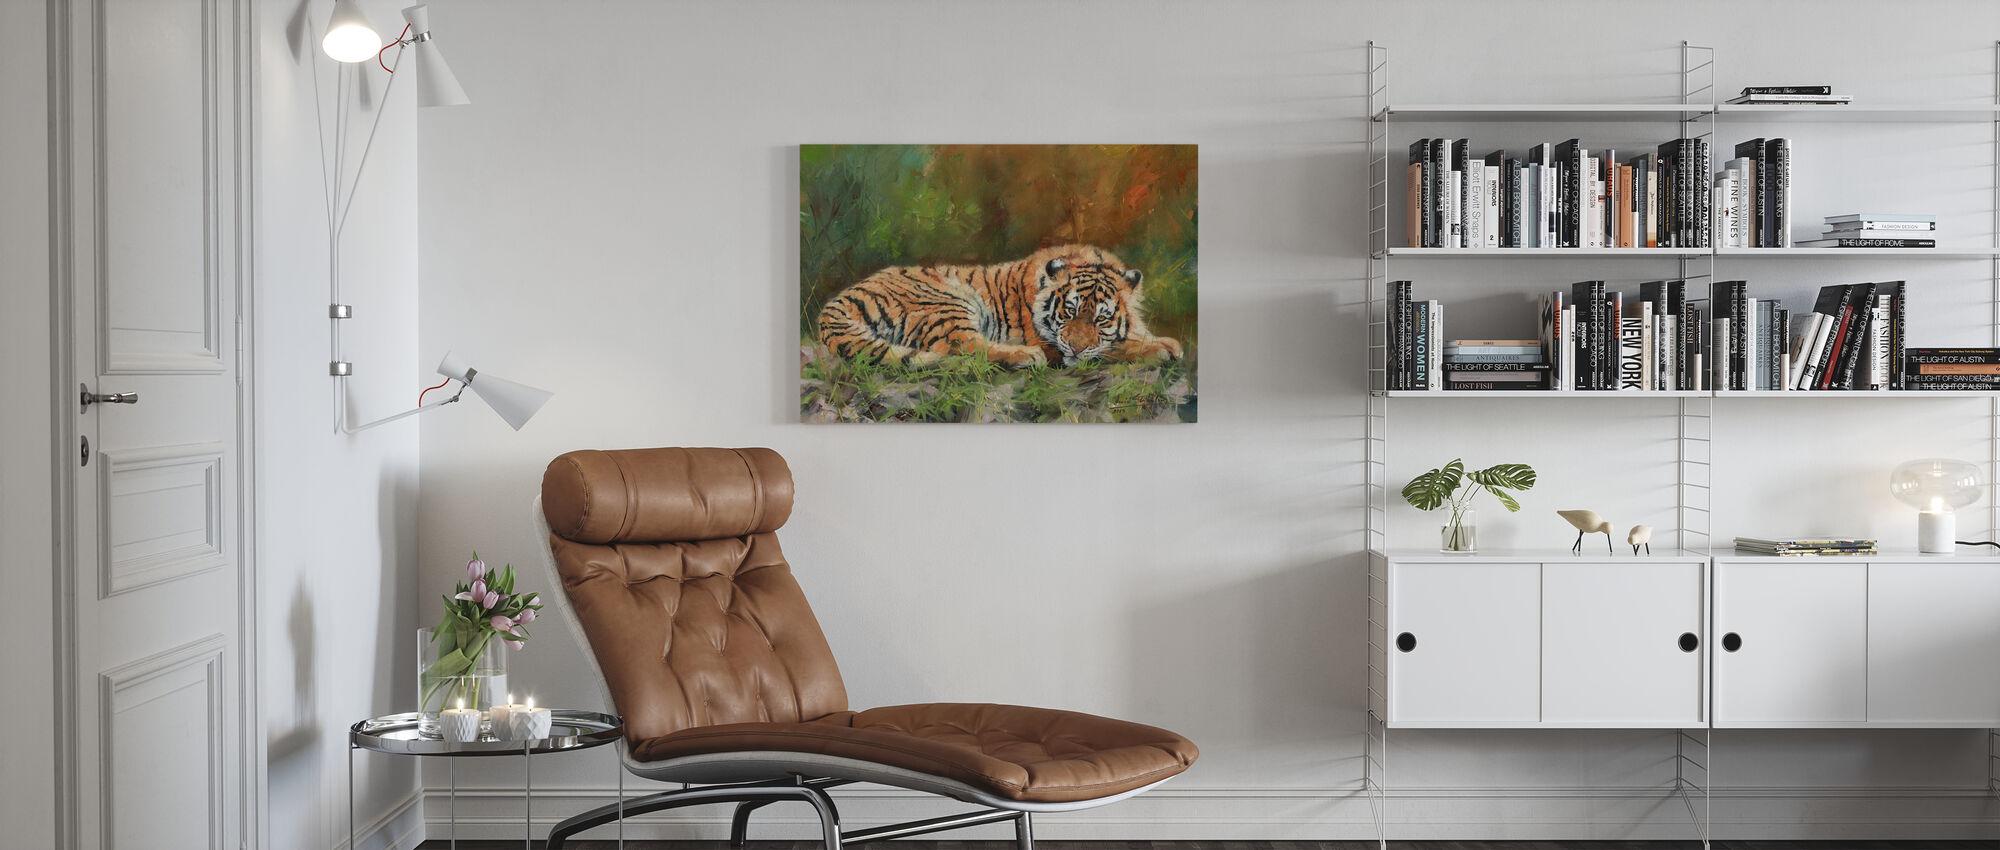 Amoer Tijger - Canvas print - Woonkamer